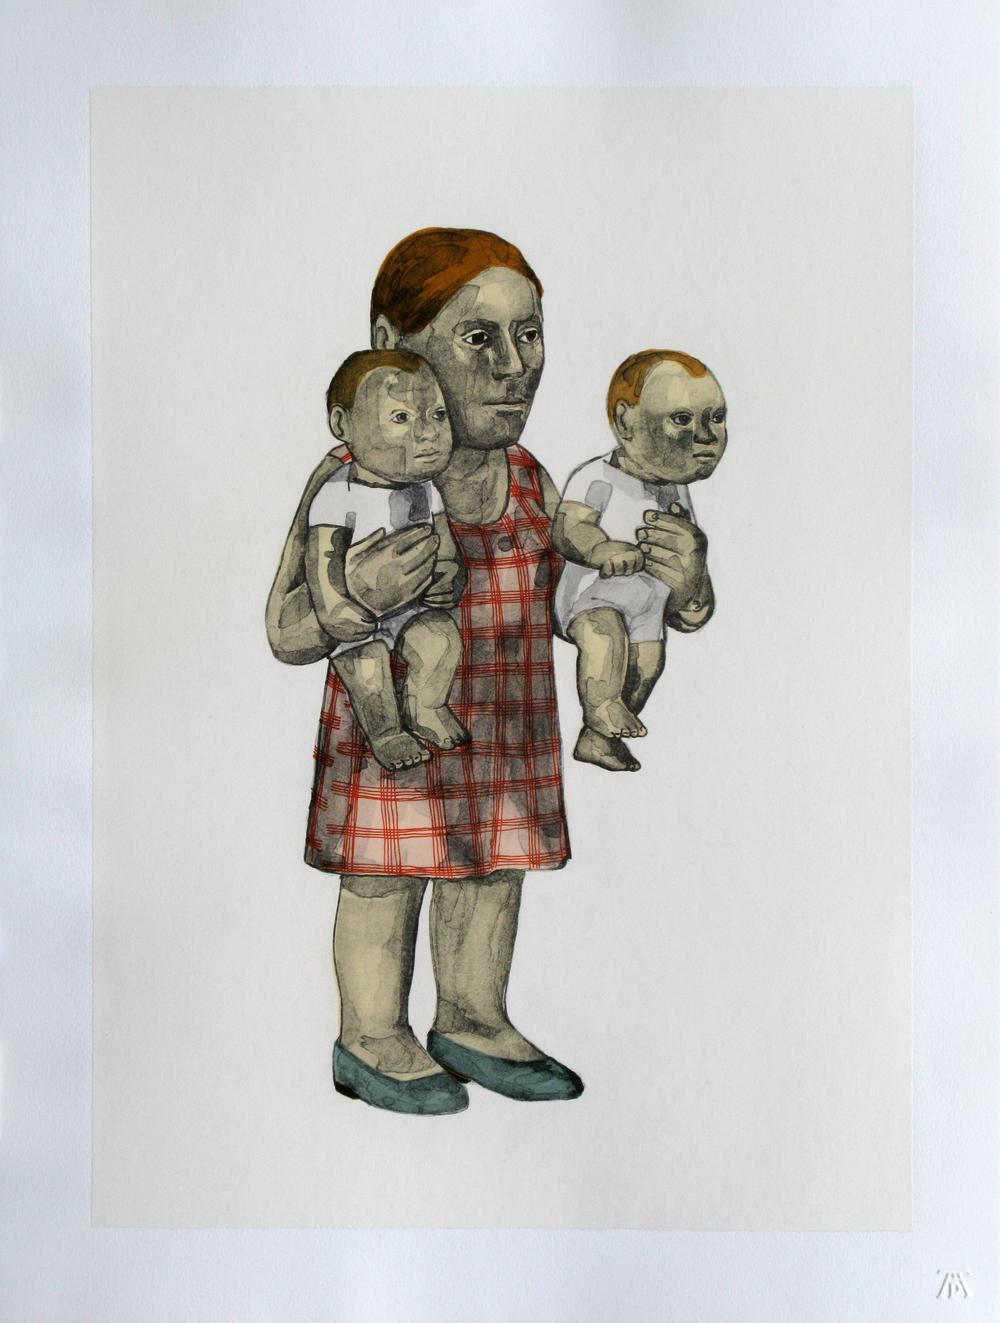 Claudette Shreuders - Two Hands hires.jpg